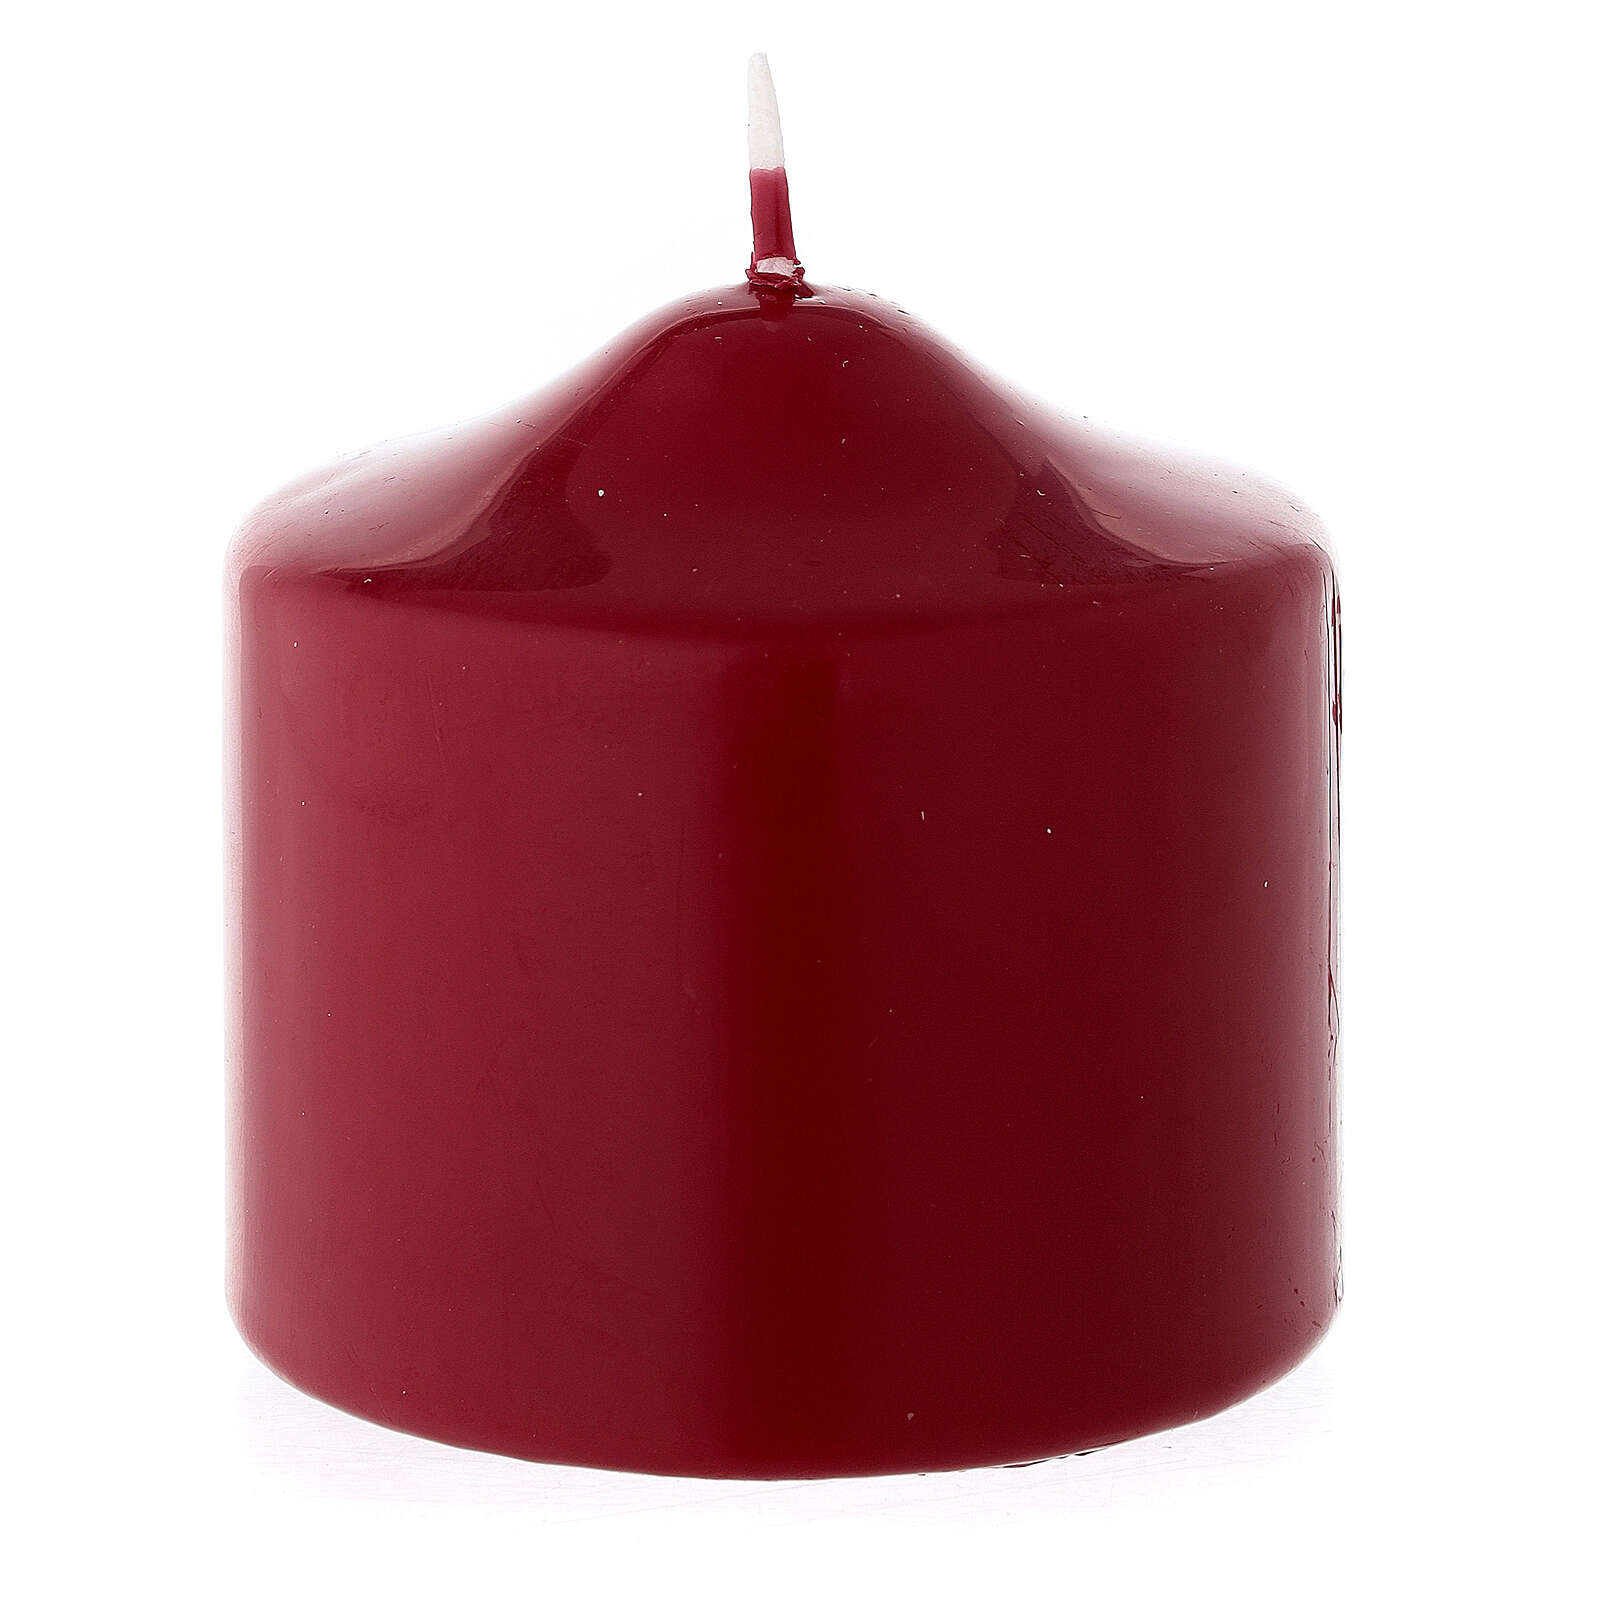 Vela Navidad de punta lacre opaco rojo oscuro 80x80 mm 3